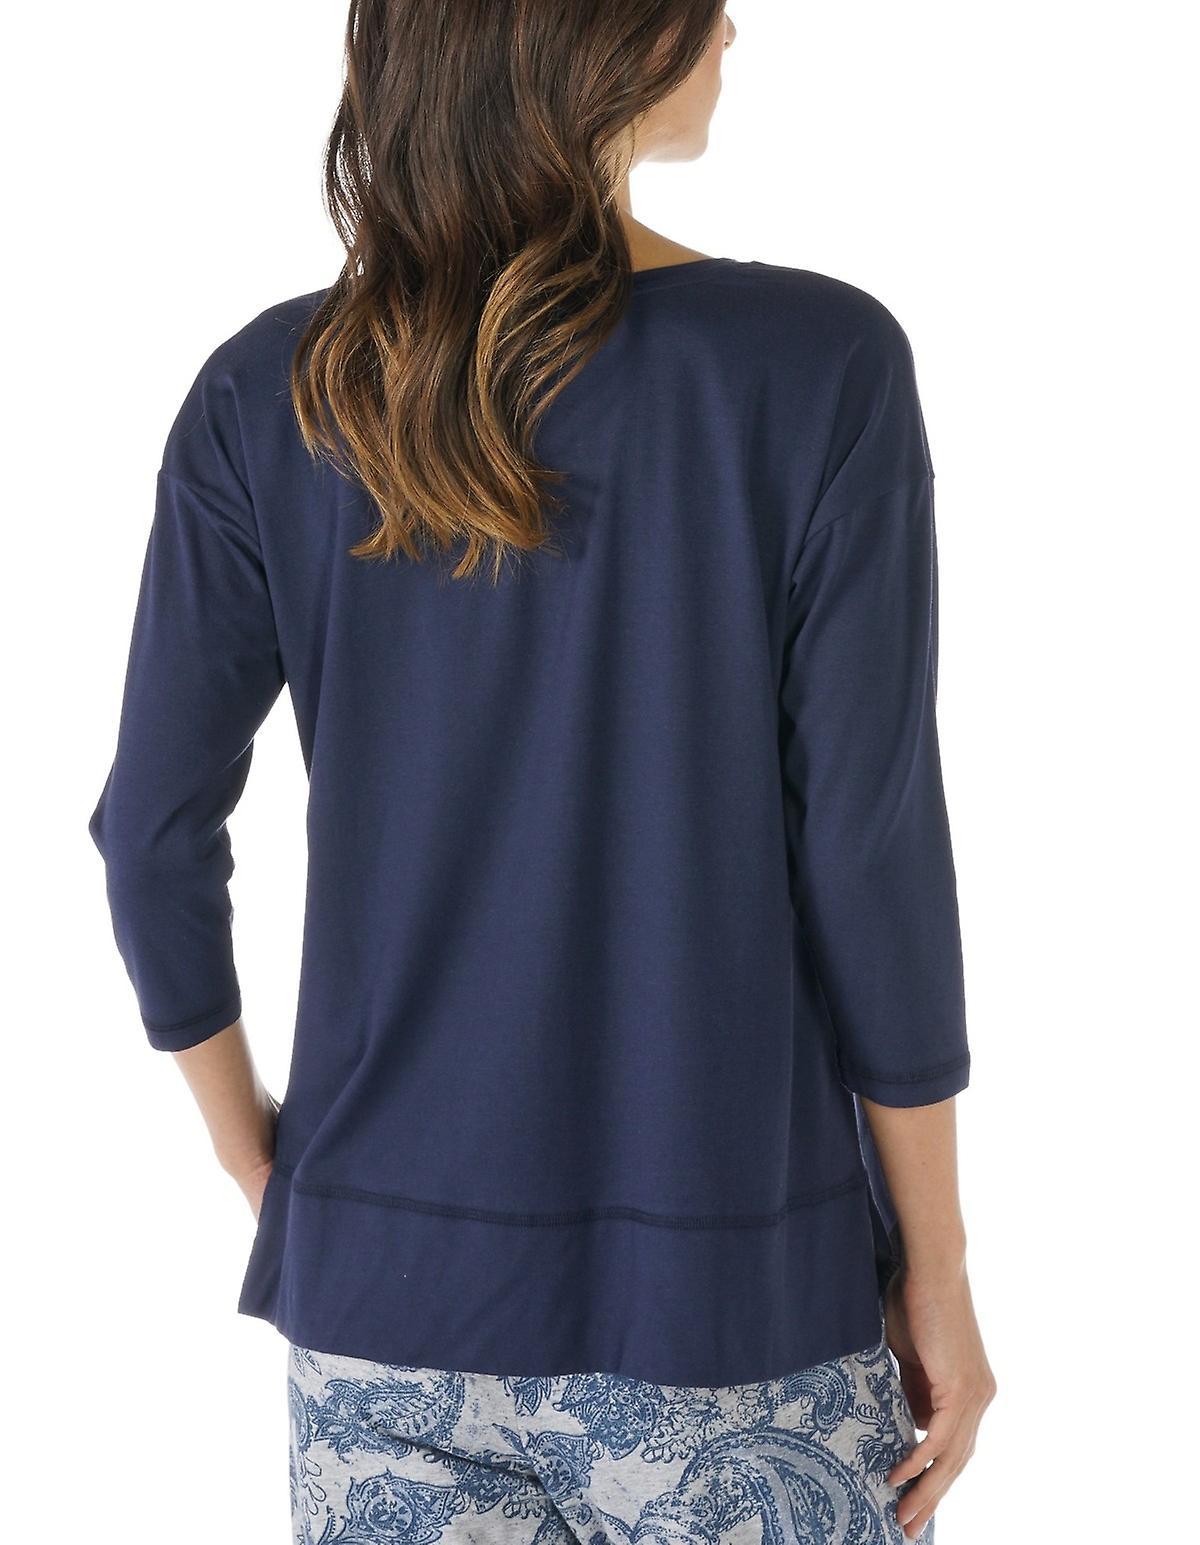 a08c0f7544 Mey 16806-408 Night2Day Nacht Blau einfarbig Pyjama 3/4 Ärmel Pyjama Top  Frauen